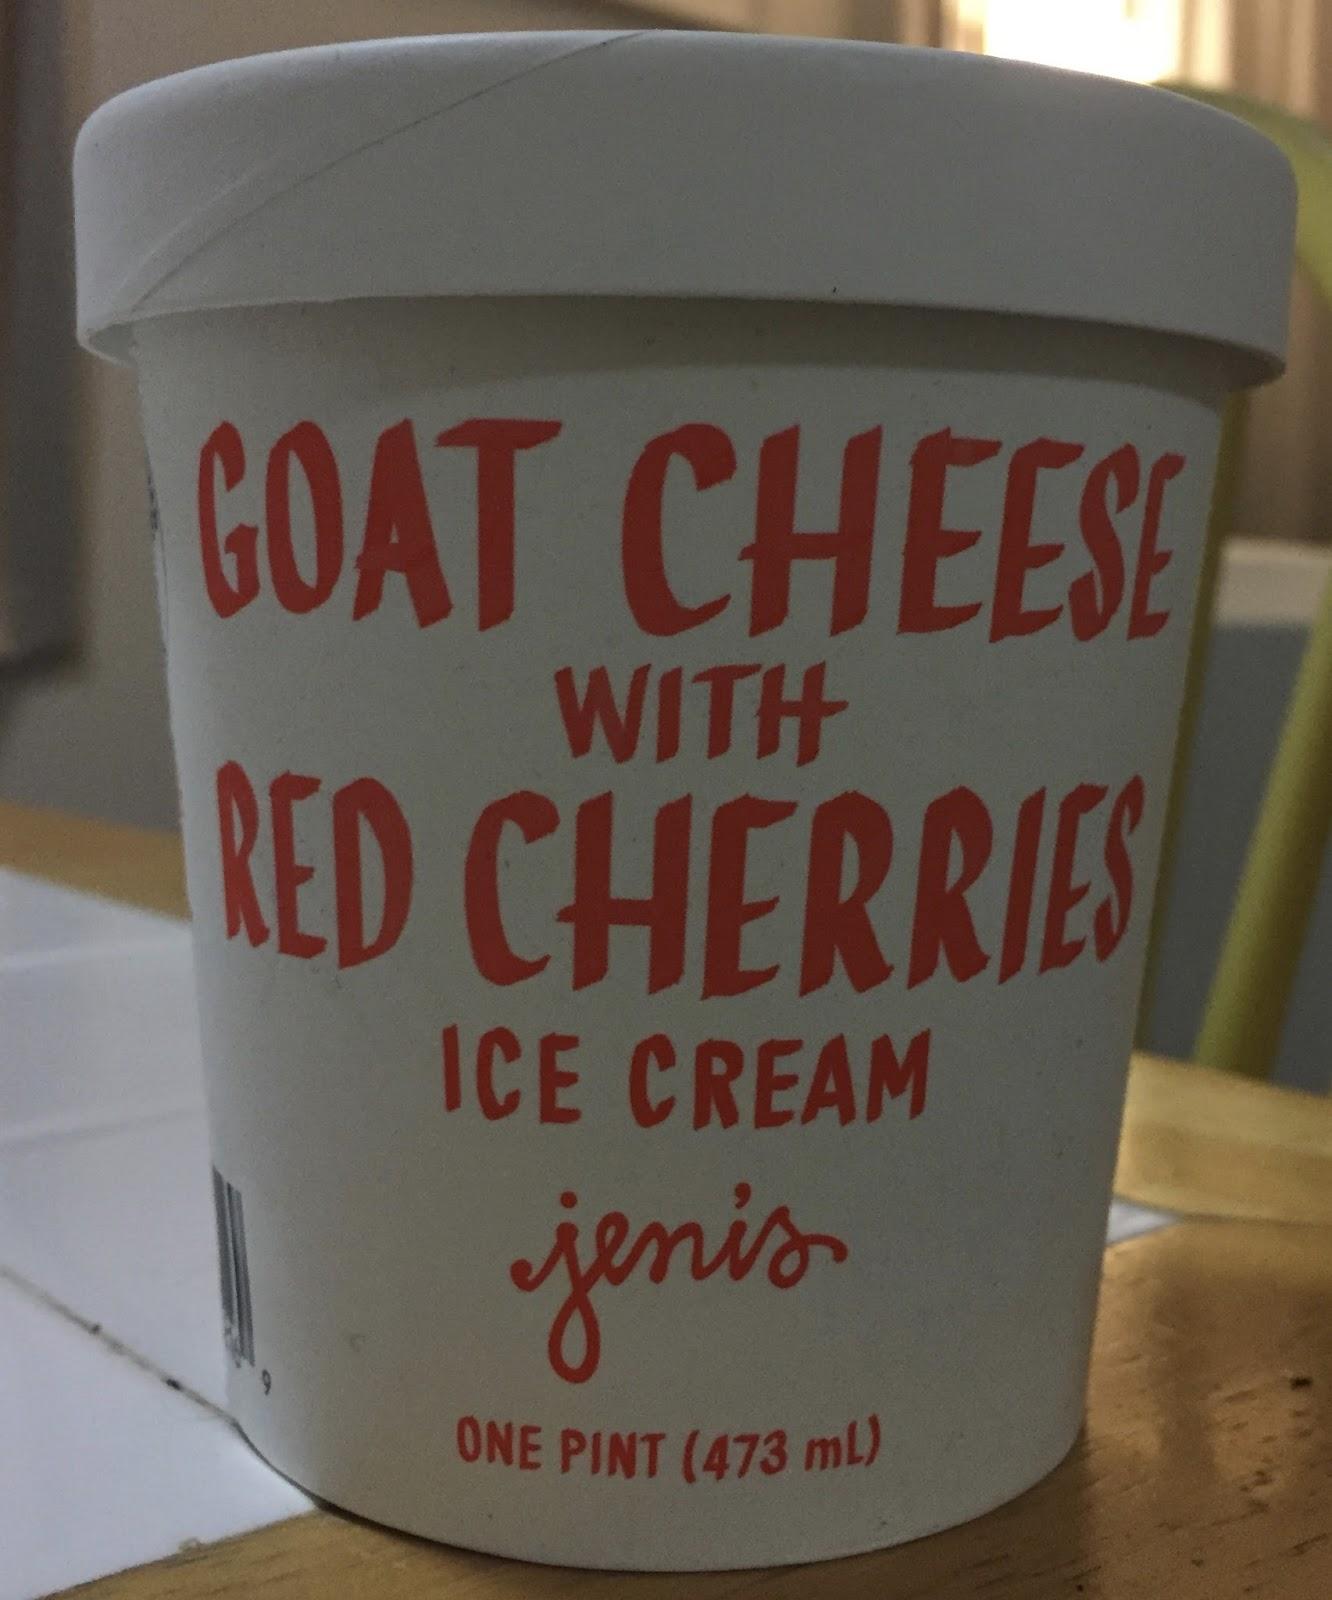 Creamery goat cheese and roasted, sweet-tart, bright-red cherries ...